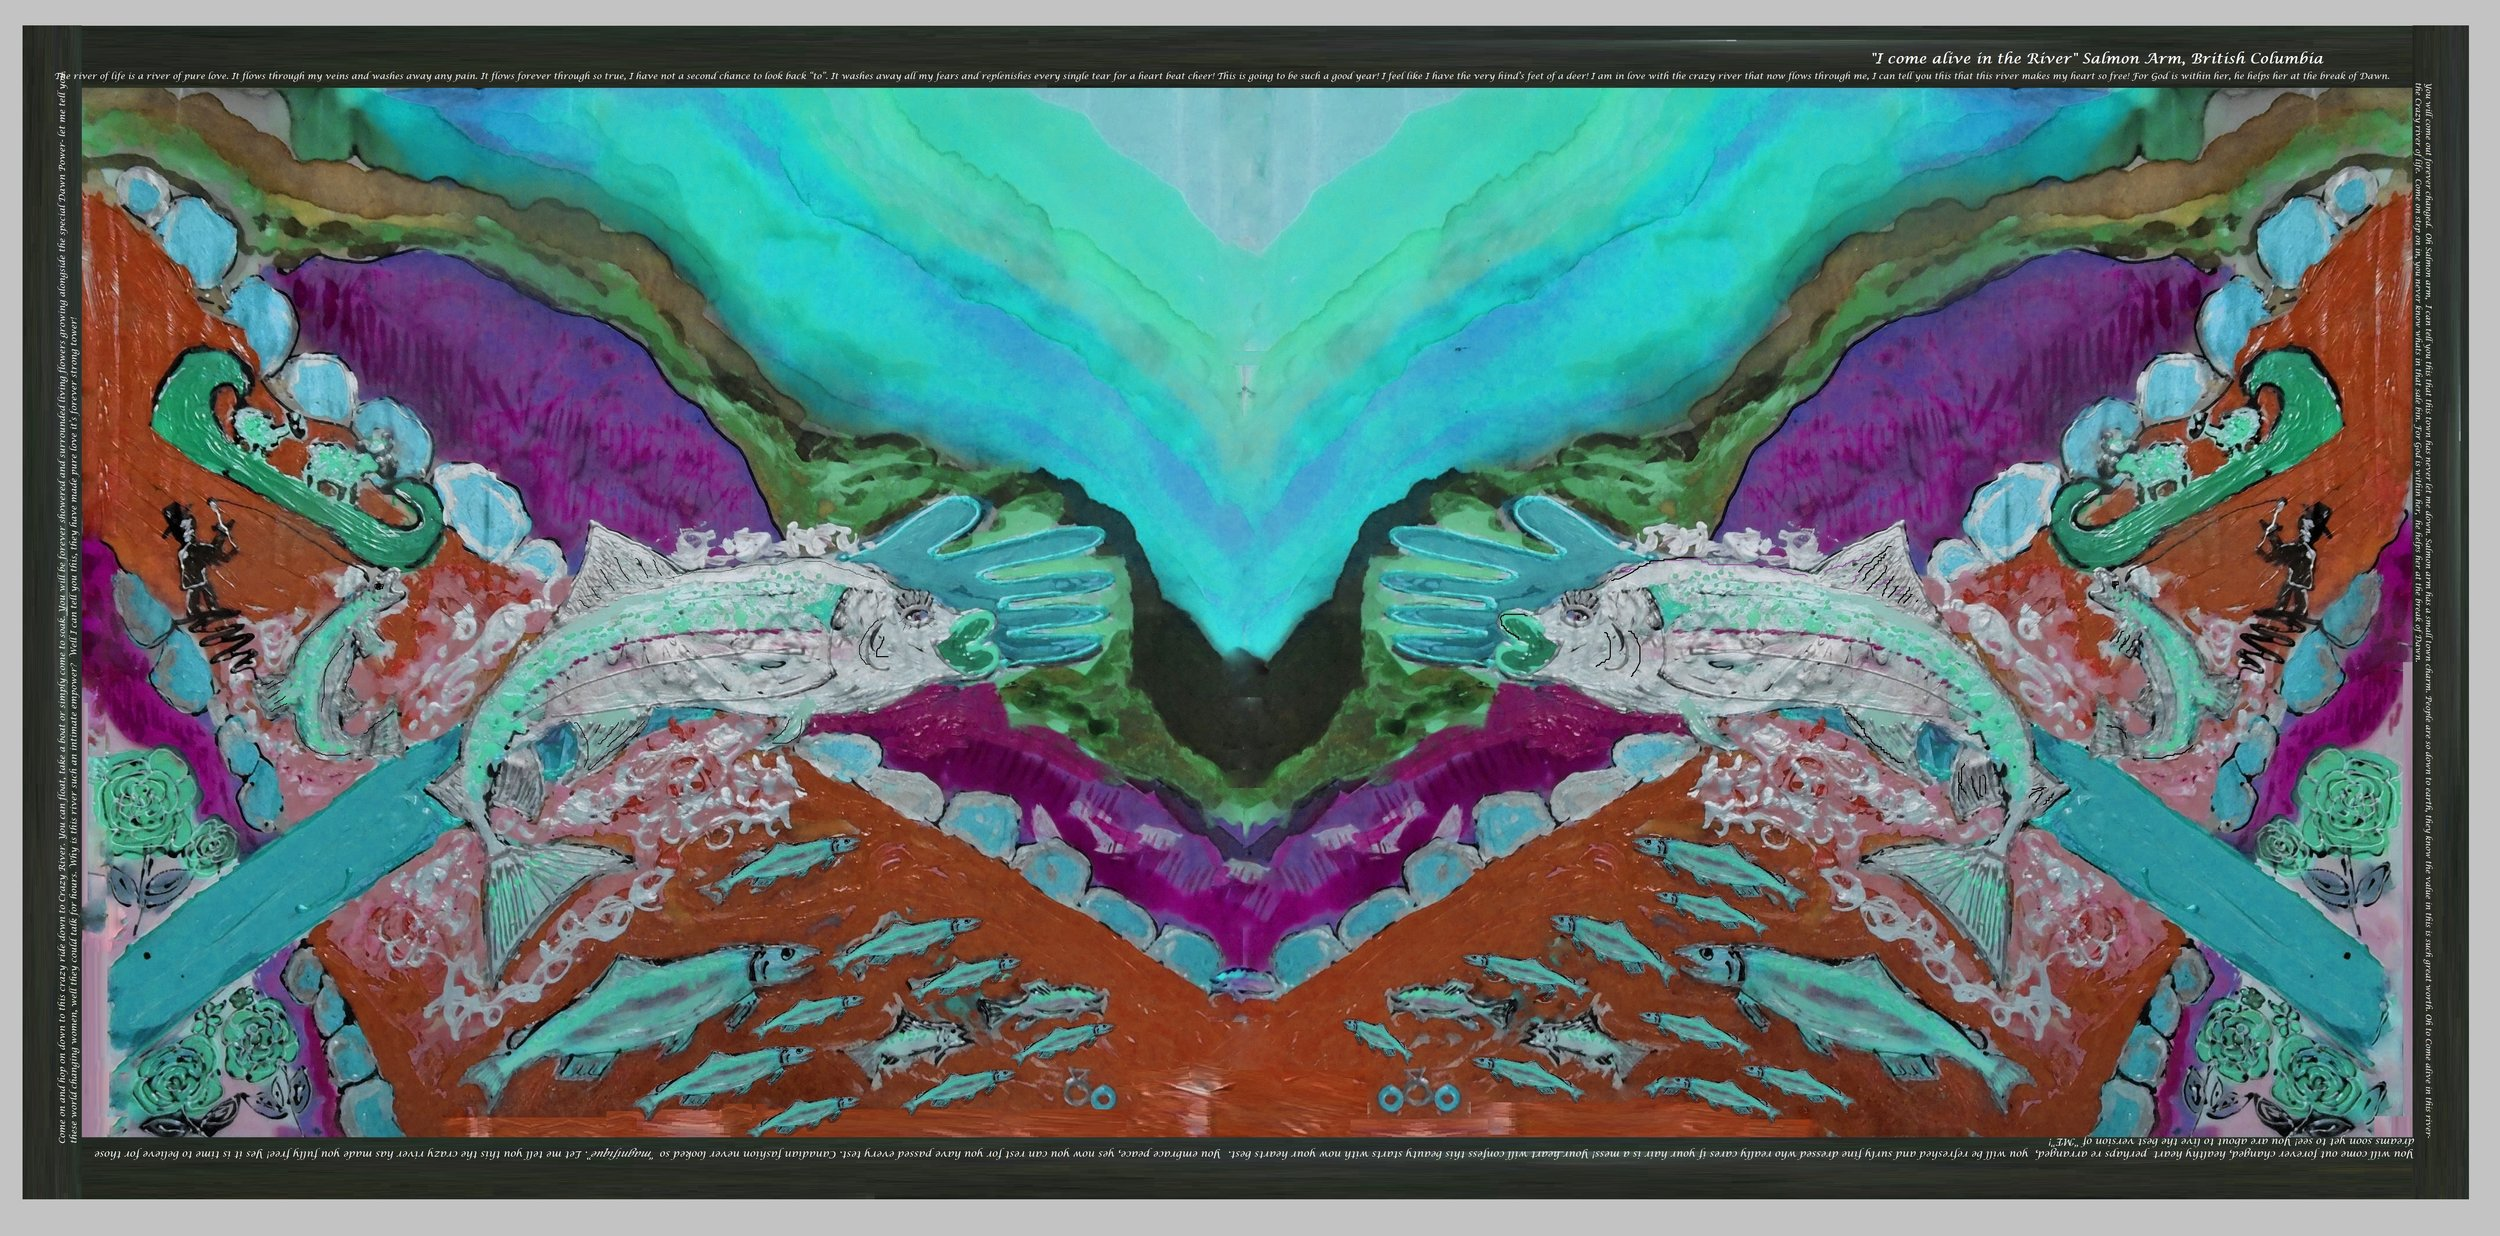 salmon arm 3.jpg